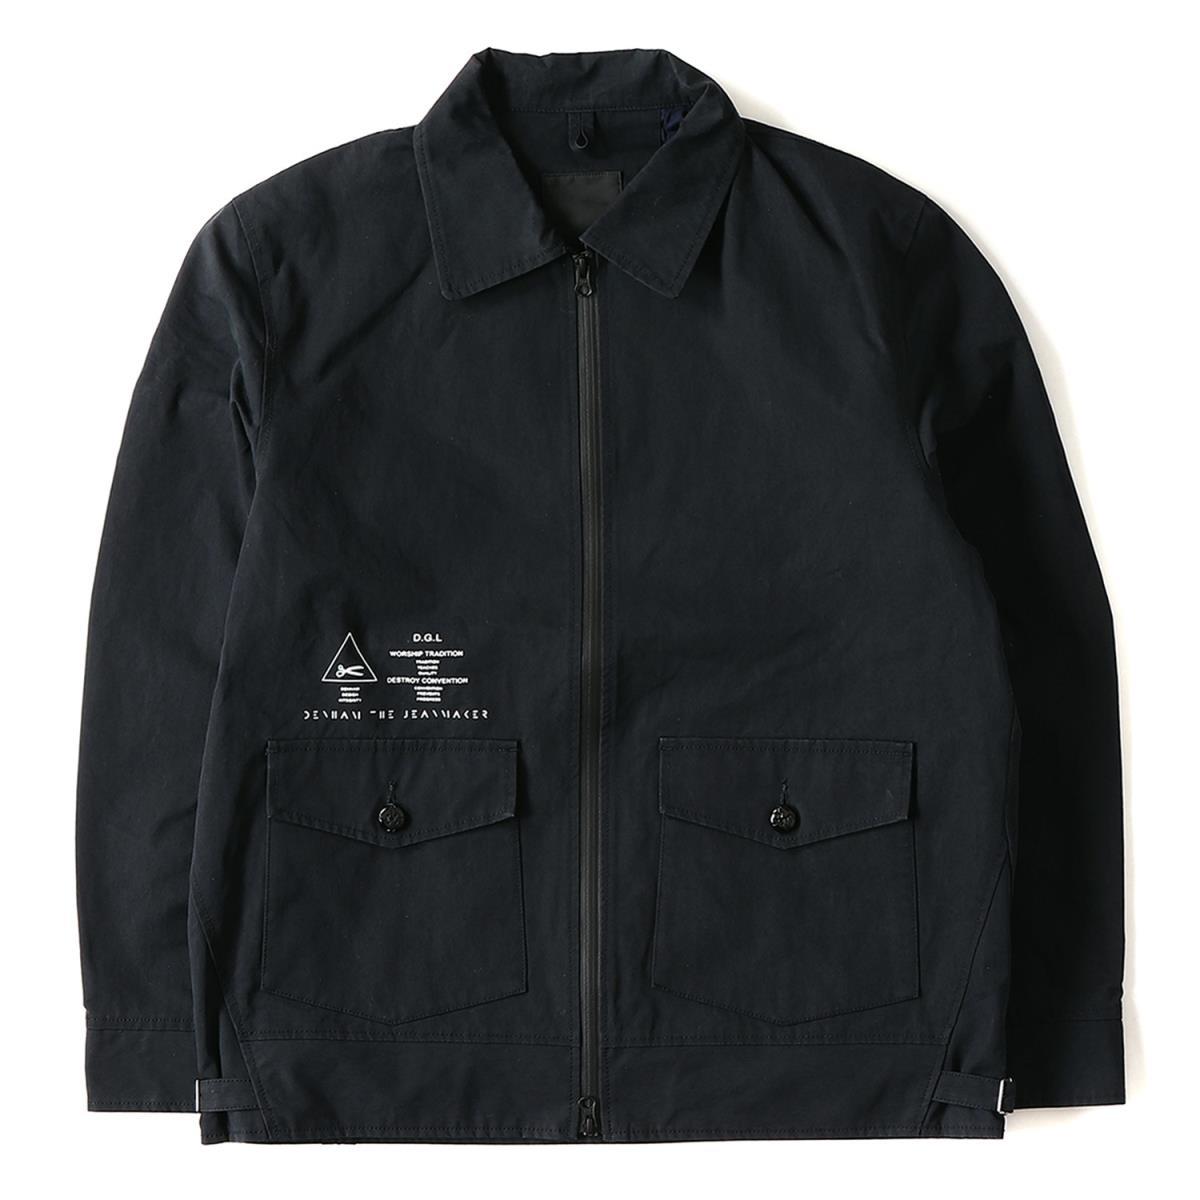 2fd6ee66f DENHAM (den ham) Japan-limited logo print T/C Bonn bar jacket (SOLID  BOMBER) navy L